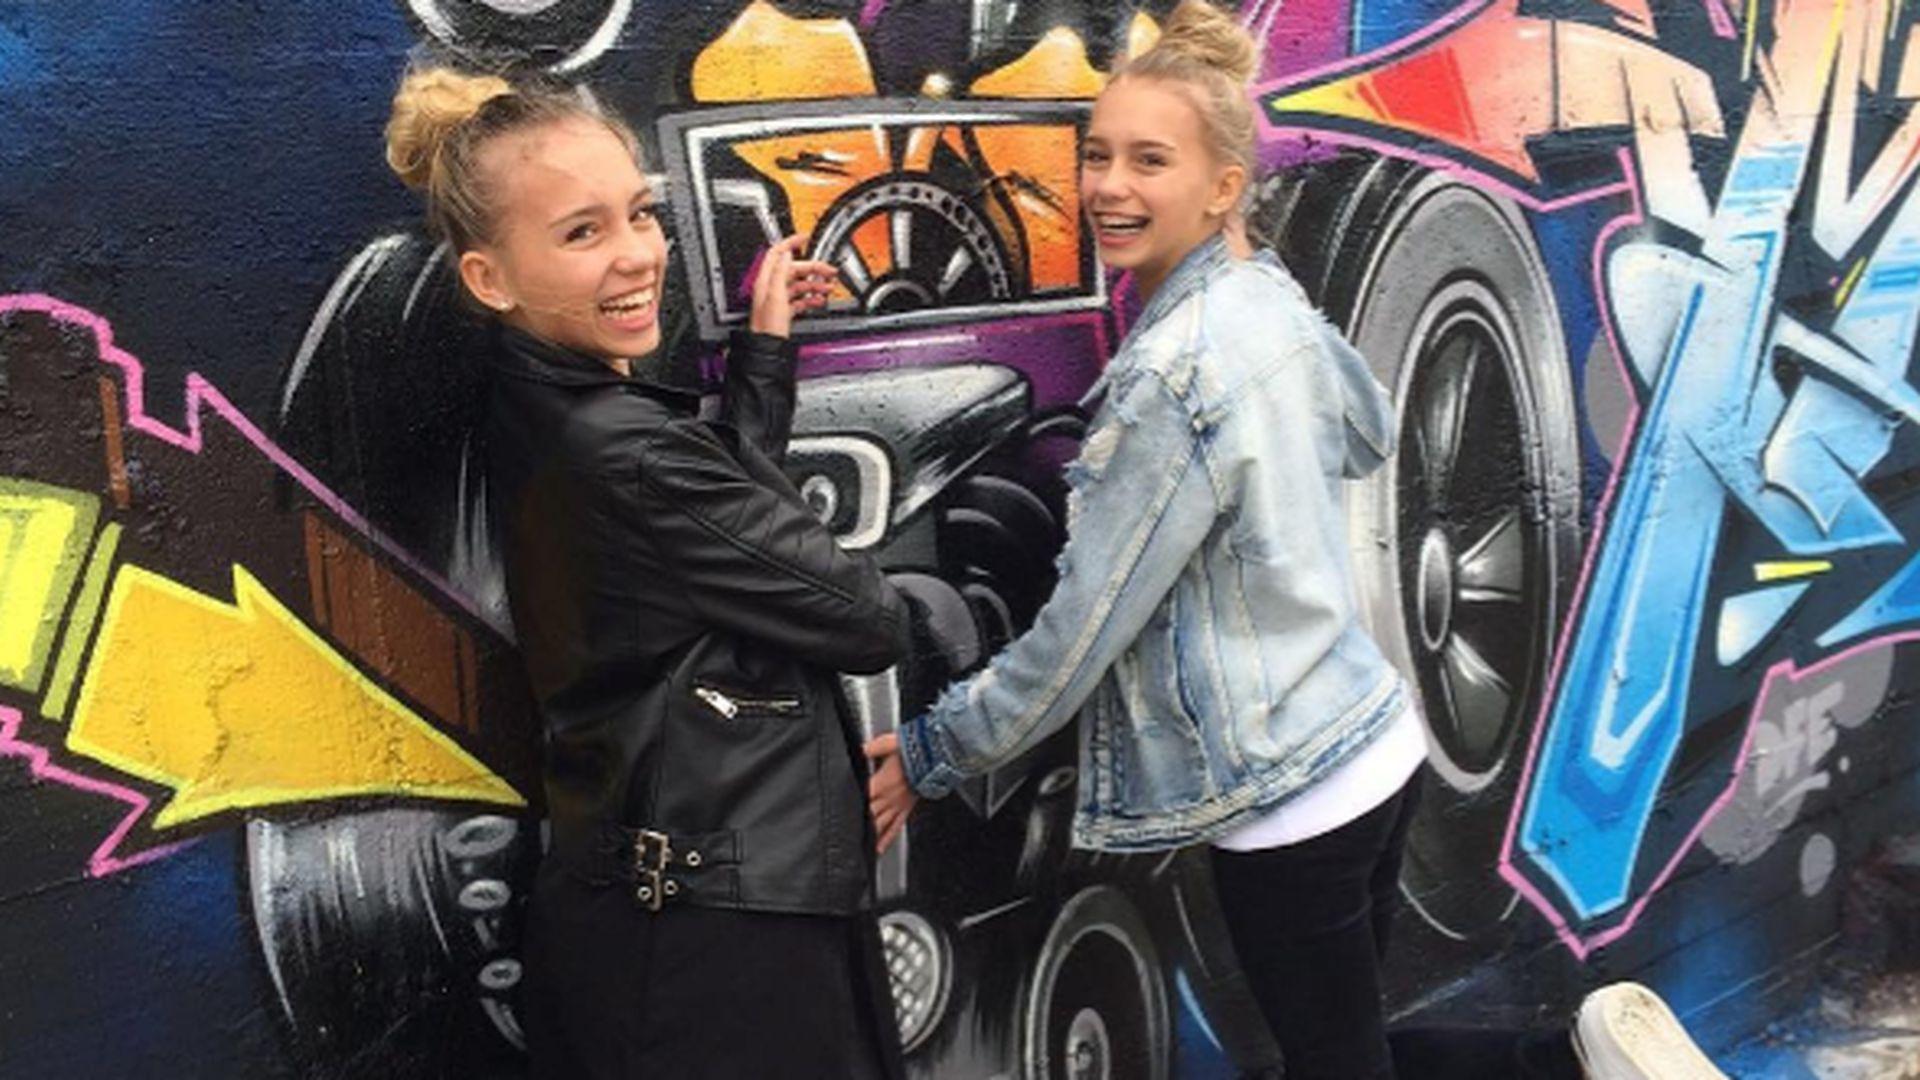 Krass! Lisa and Lena übertrumpfen YouTube-Bibi & Dagi